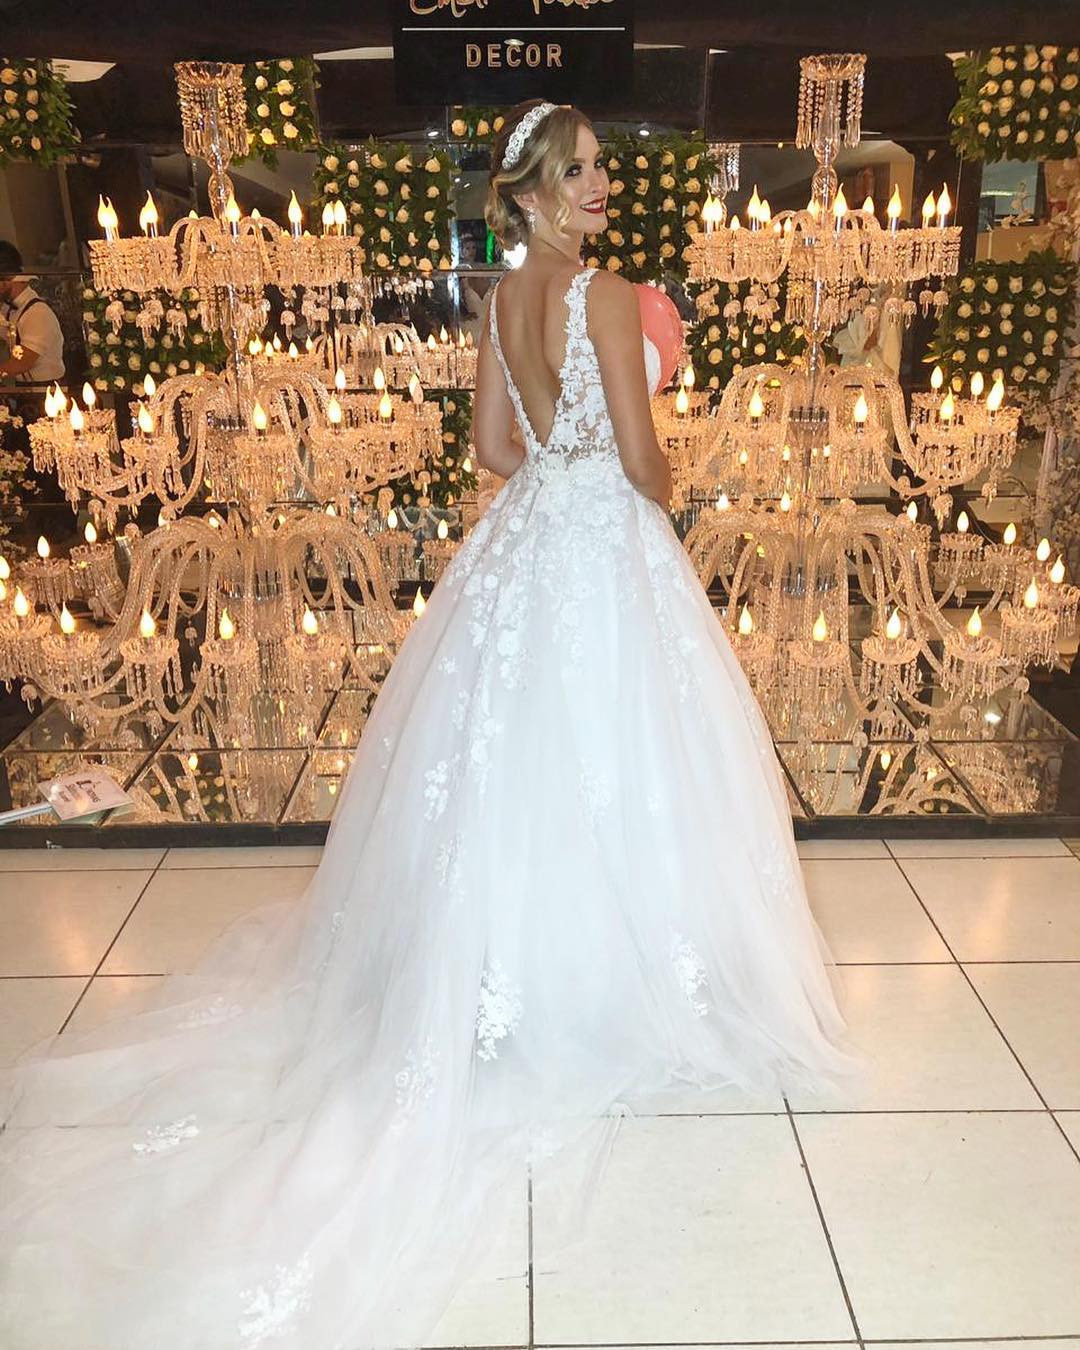 larissa neiverth, top 20 de miss brasil mundo 2019. - Página 4 Qgm3b410